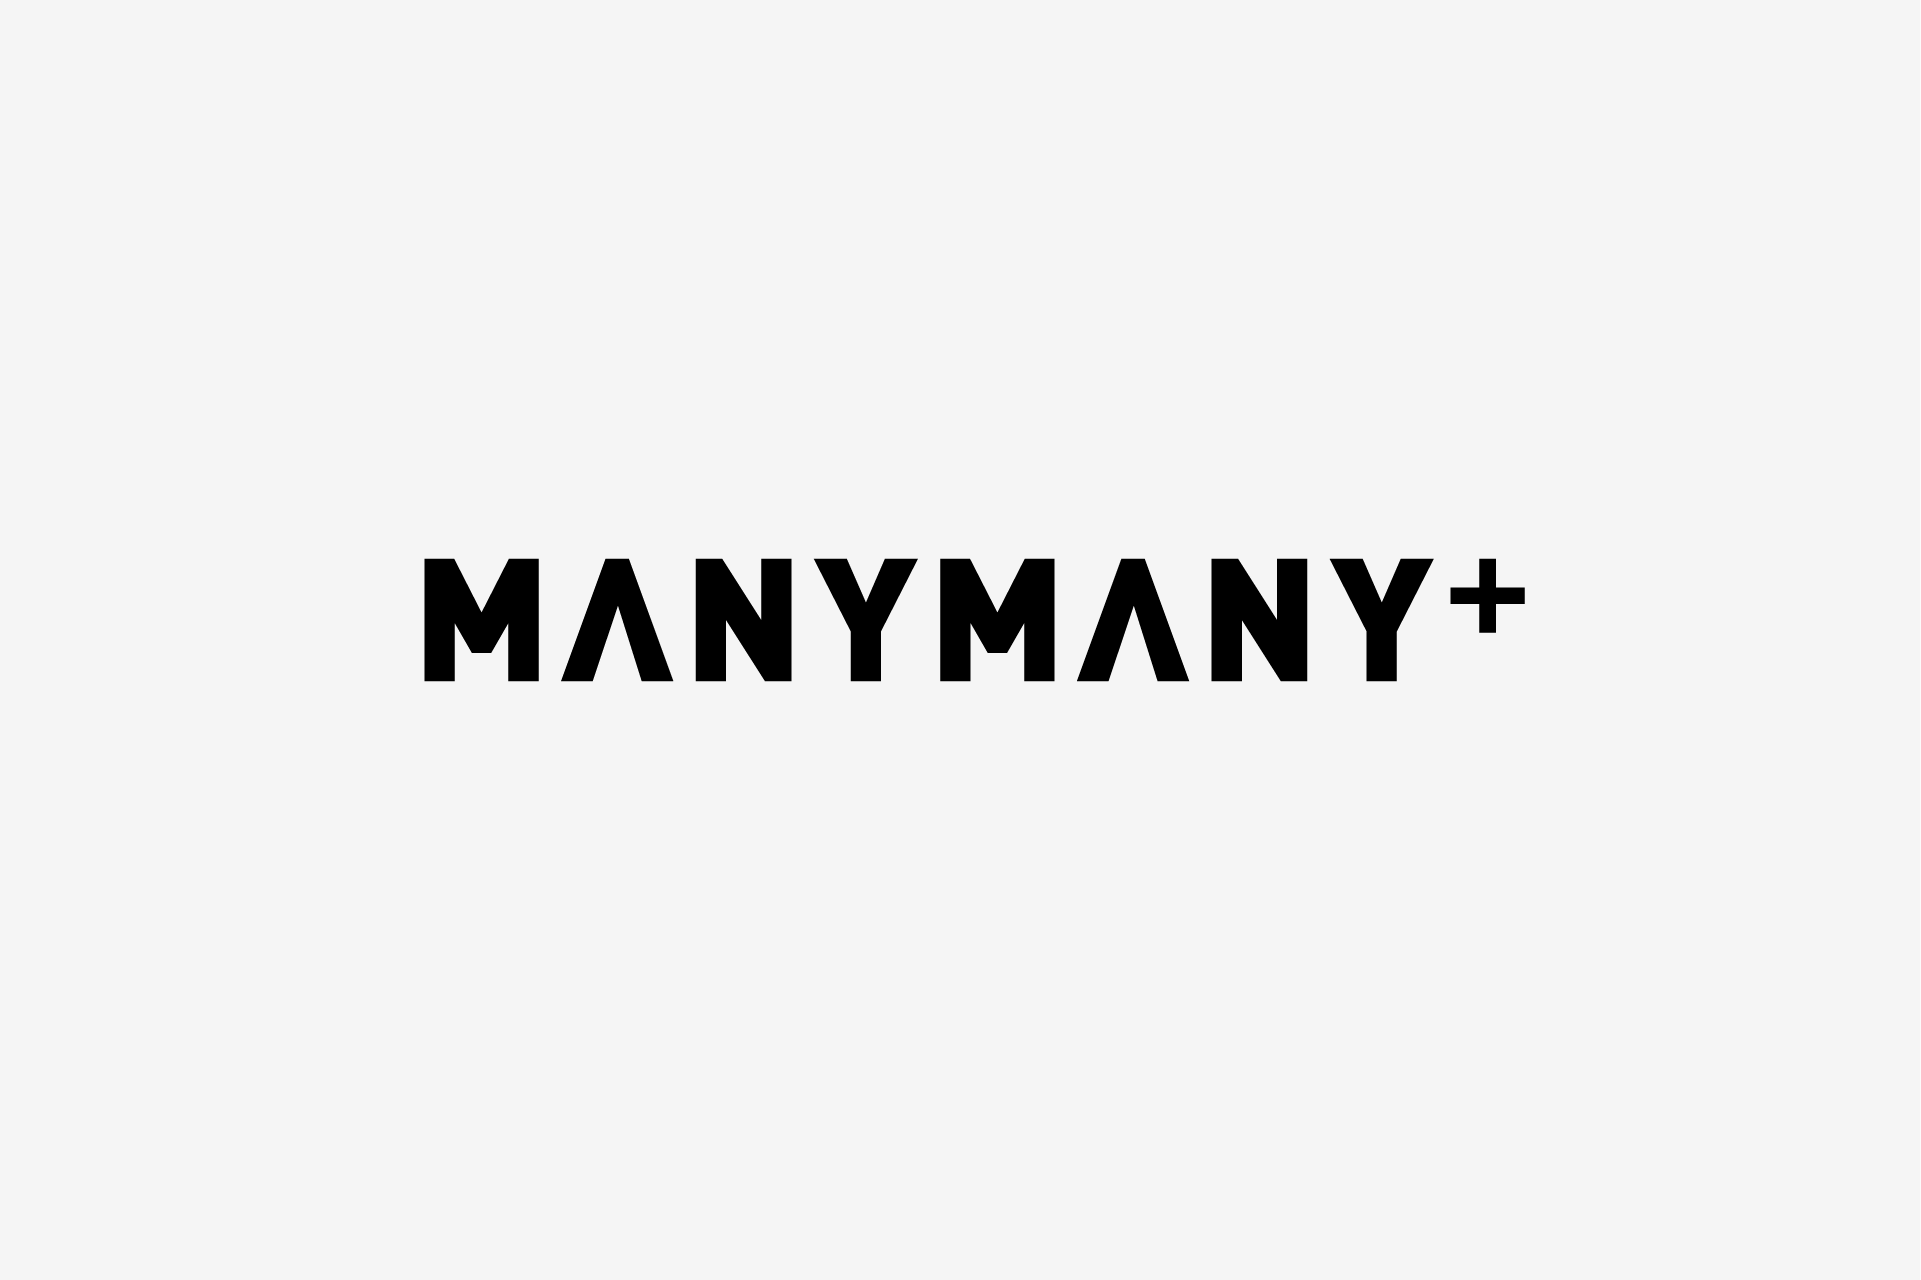 manymany-plus_02